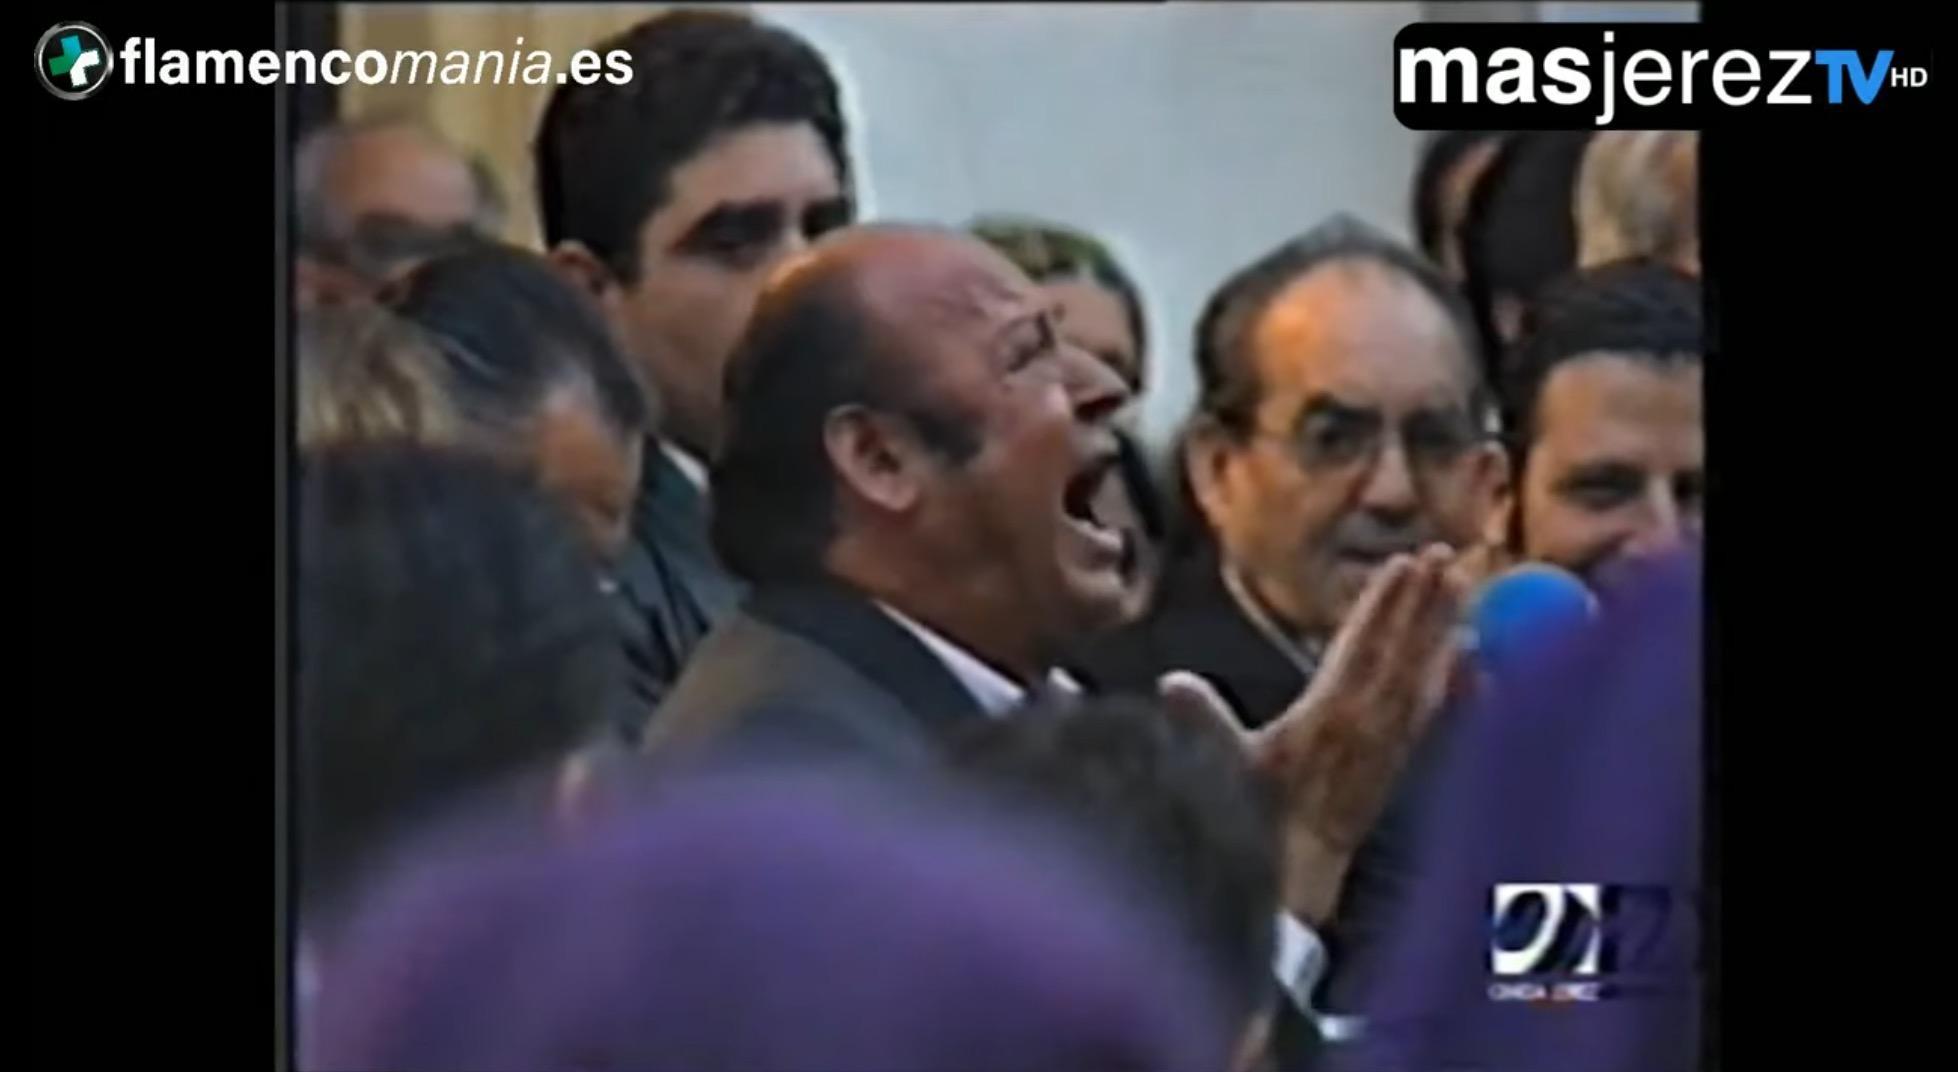 Flamencomanía TV: YoMeQuedoEnCasa - Día 16 - Así canta Saetas Jerez (I)